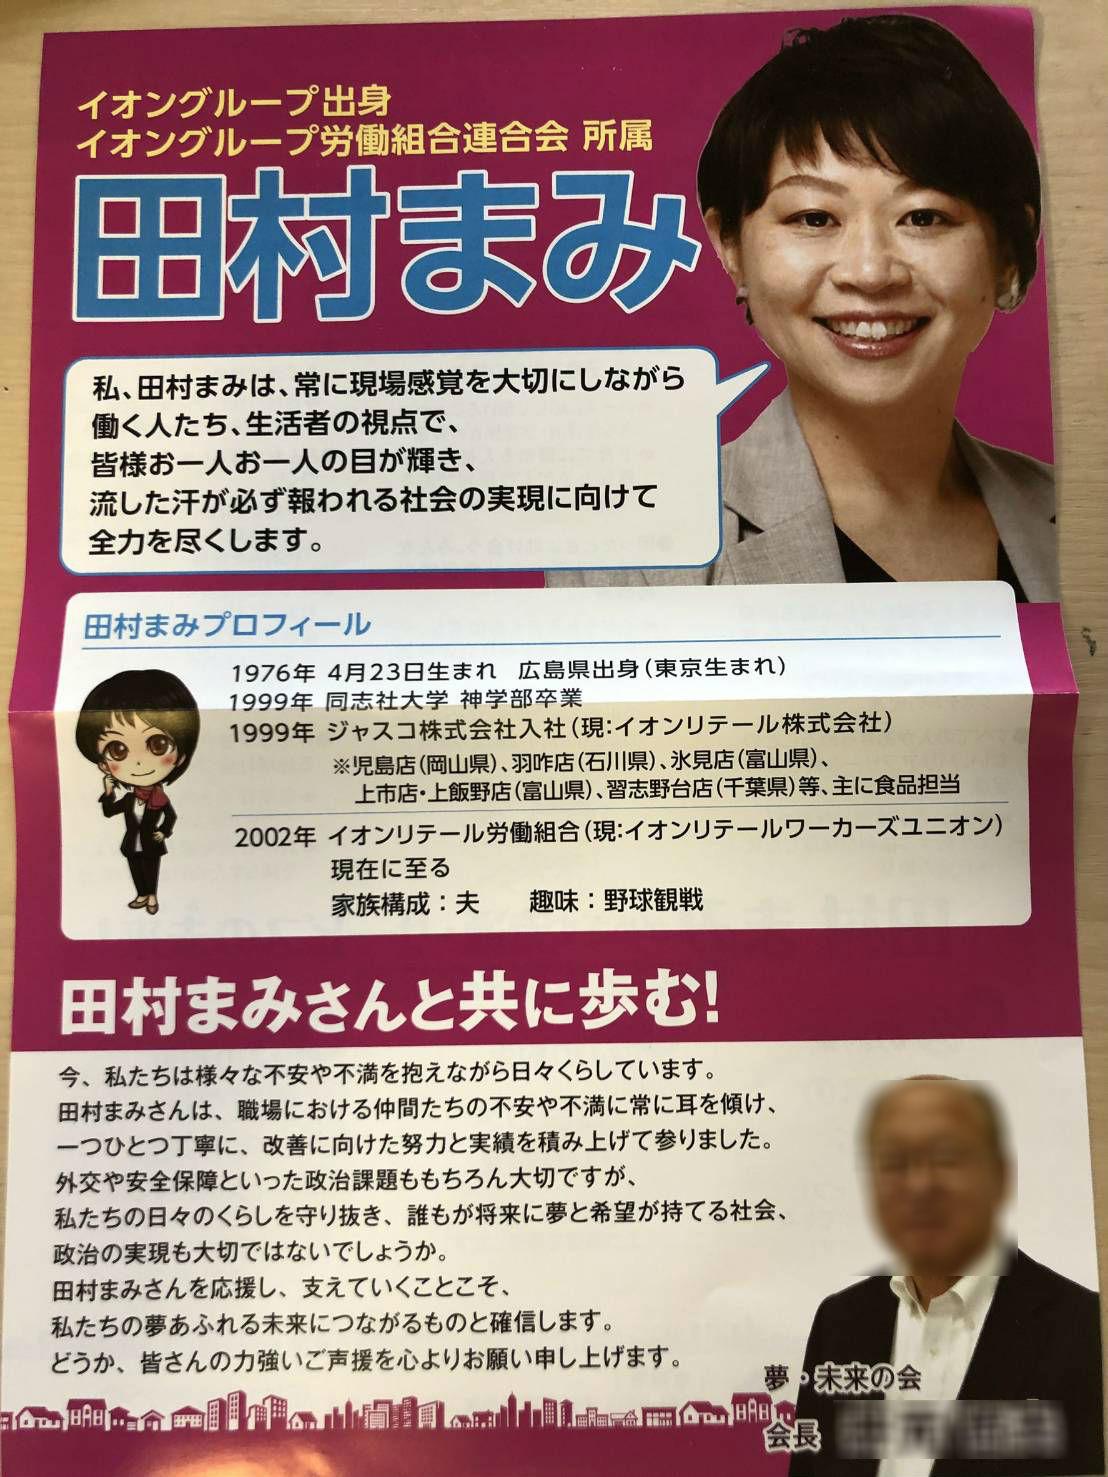 http://hunter-investigate.jp/news/938c853633bb7f0145762912f02238bfcd69e34e.jpg